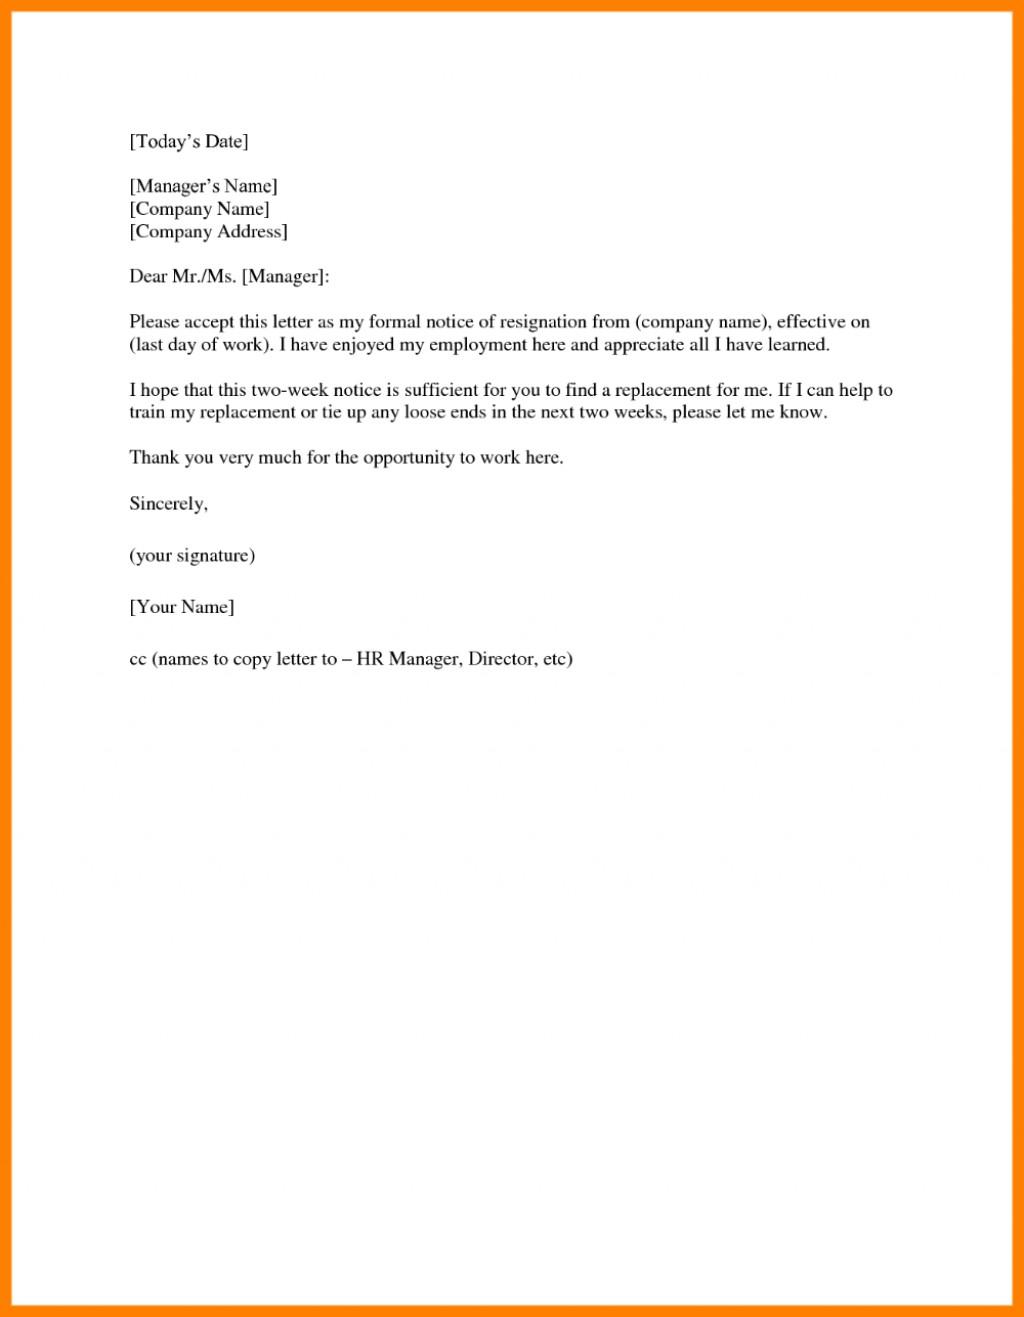 005 Stupendou 2 Week Notice Template Word Inspiration  Free MicrosoftLarge